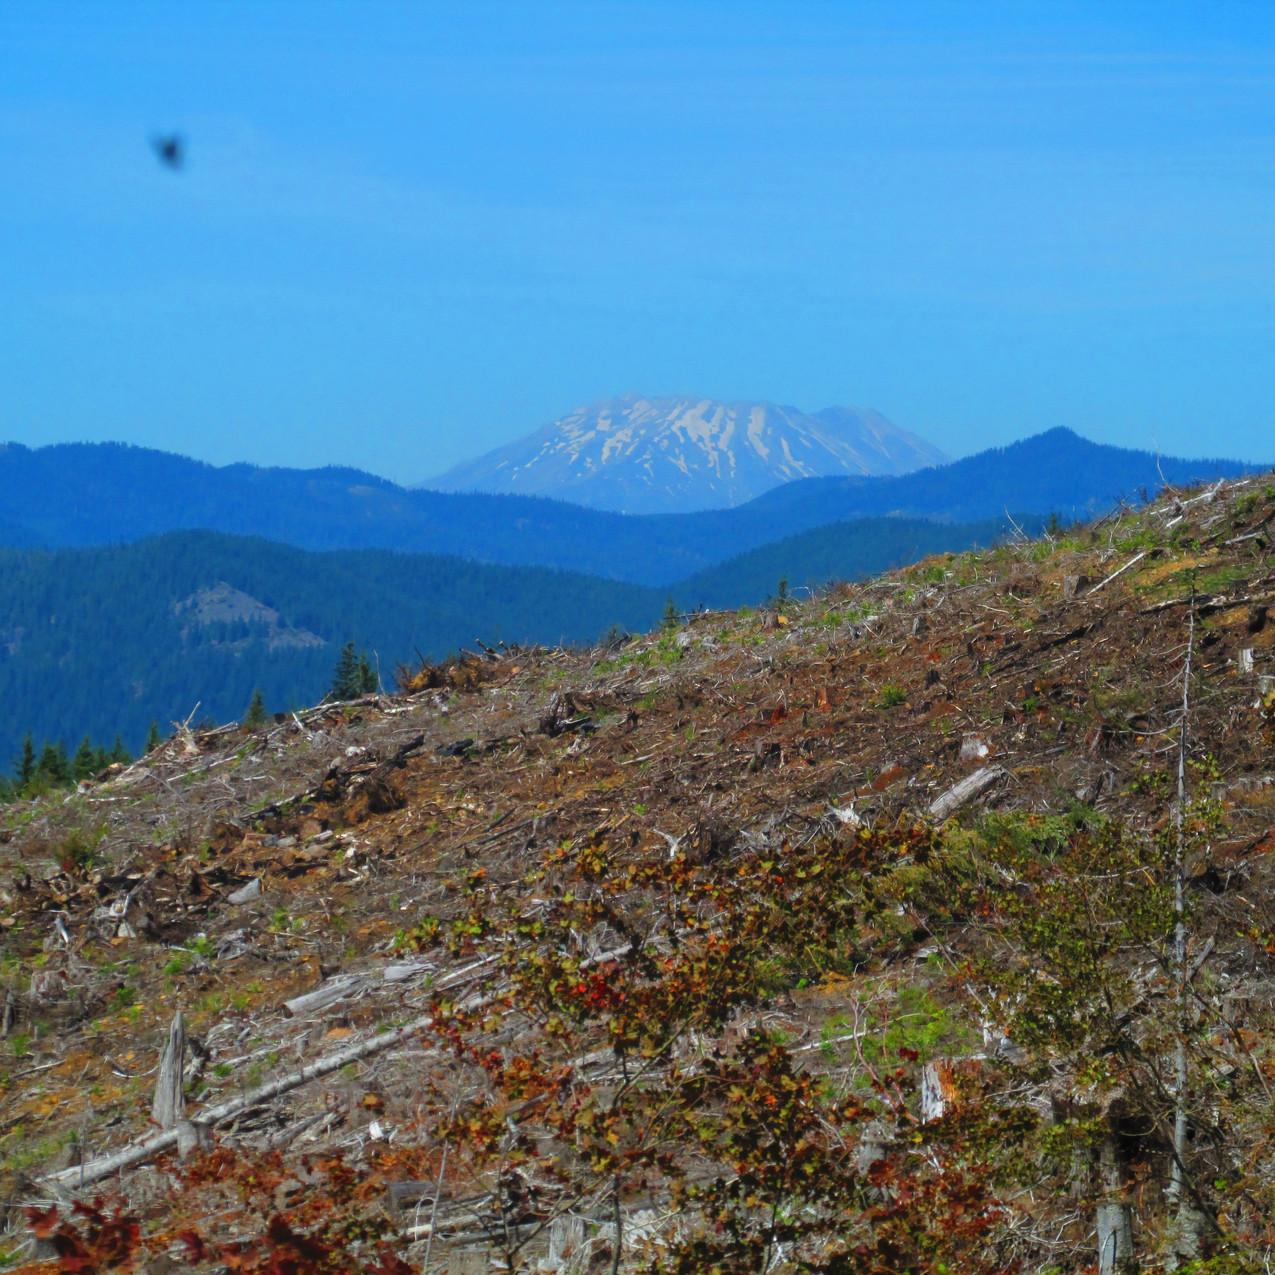 This mountain is the reason I grew up in Washington.